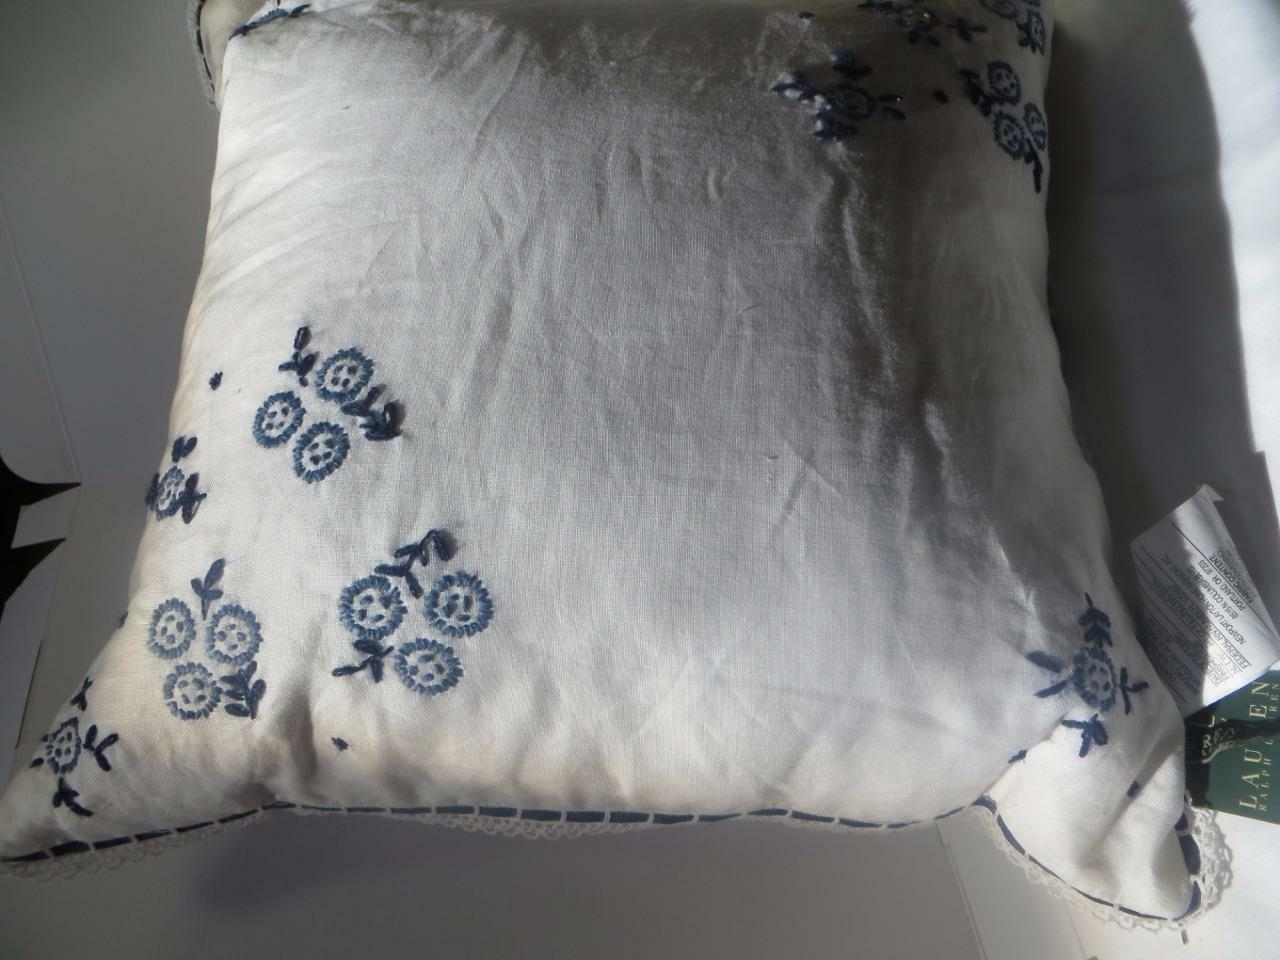 Ralph Lauren Cote D'azur Linen Lace Insert & Embroidery 20x 20 in Pillow New